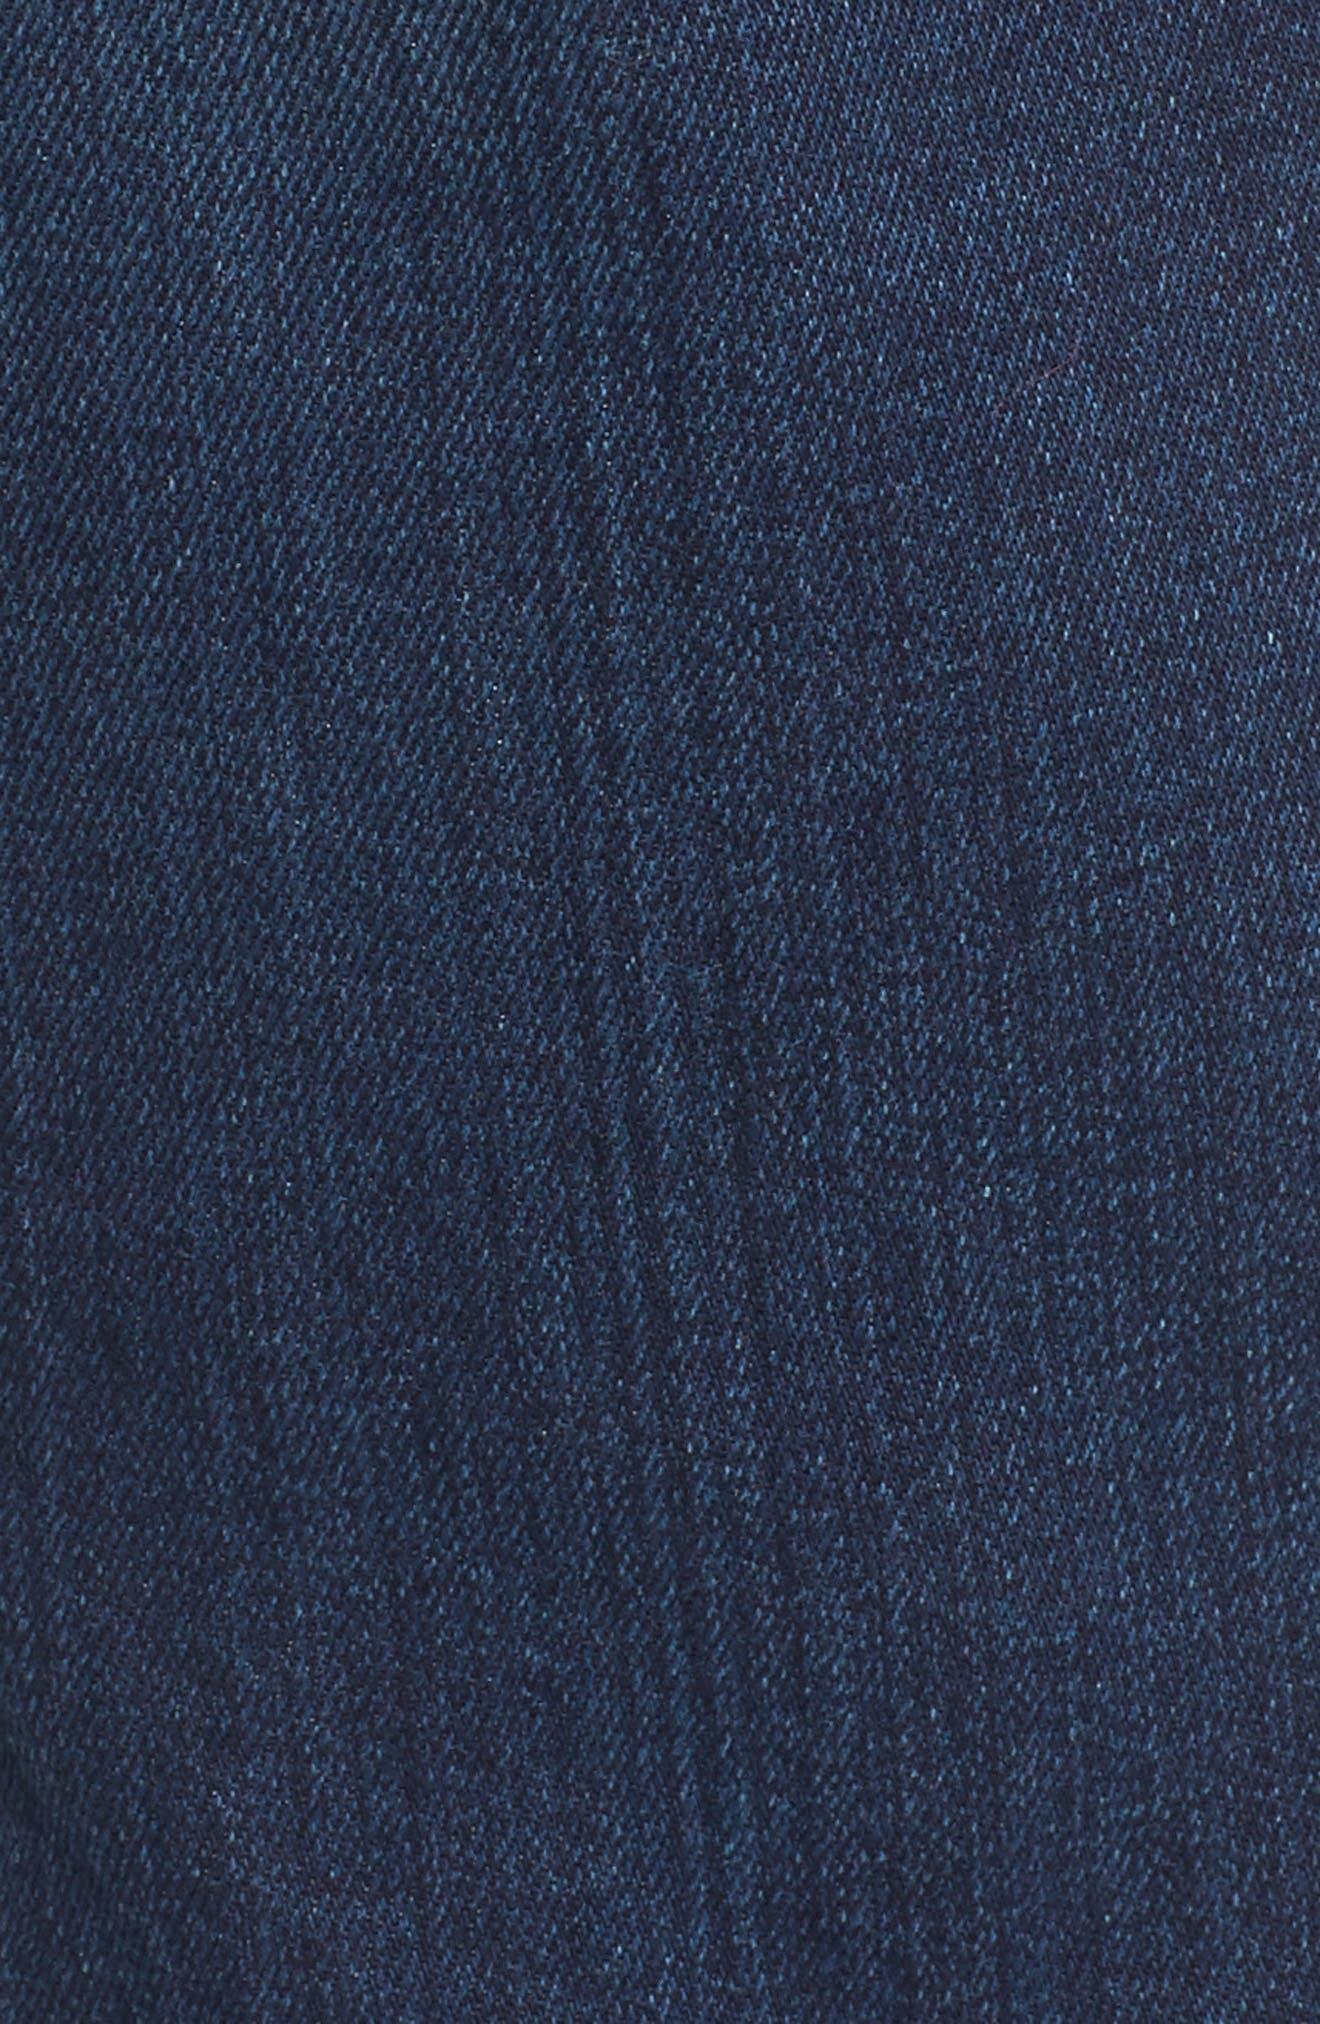 Zatiny Bootcut Jeans,                             Alternate thumbnail 5, color,                             084BU